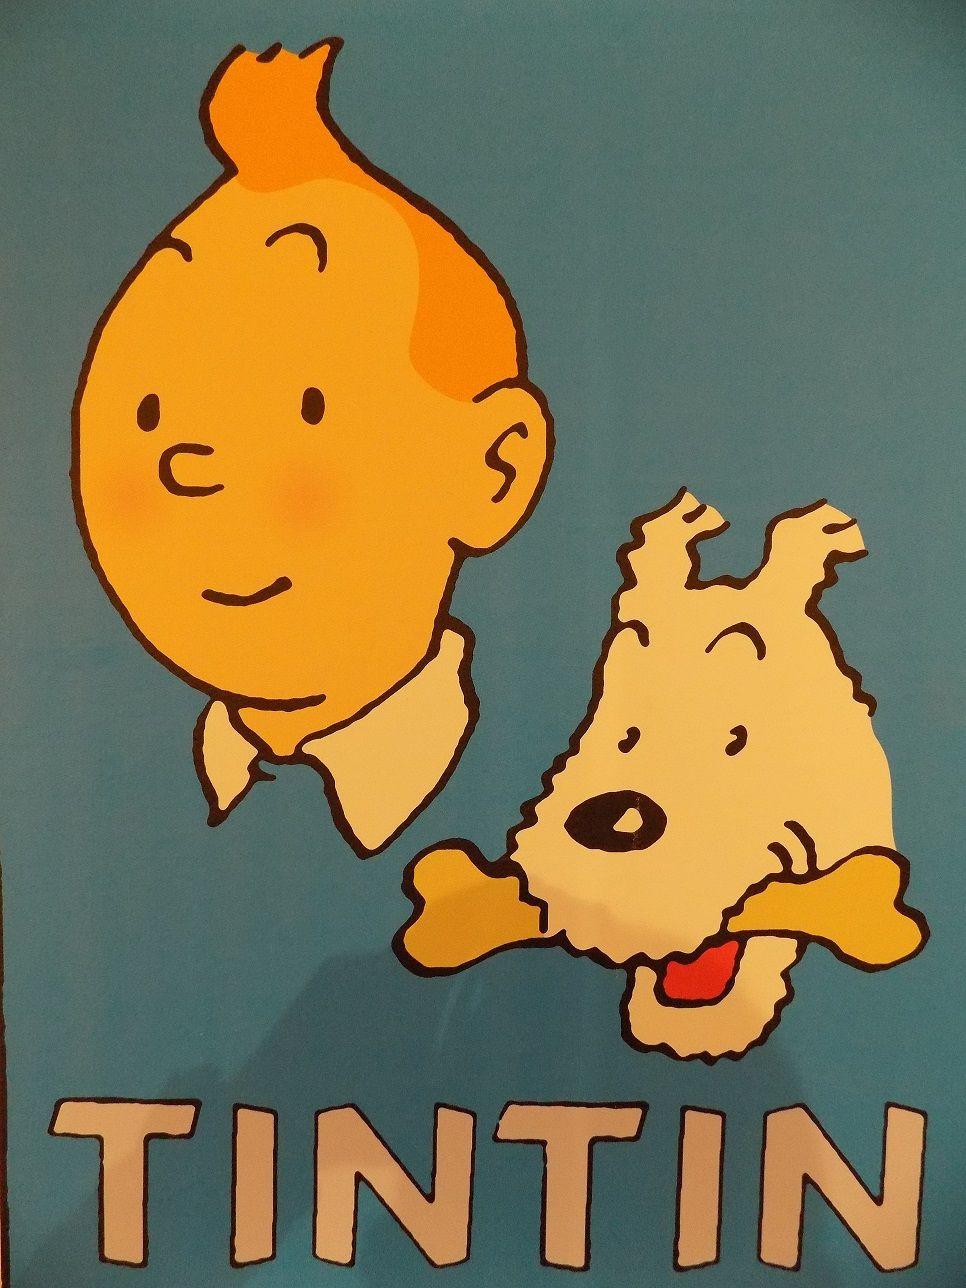 Papier Peint Tintin Et Milou affiche tintin et milou 1955 | tintin un altruiste (ma collection